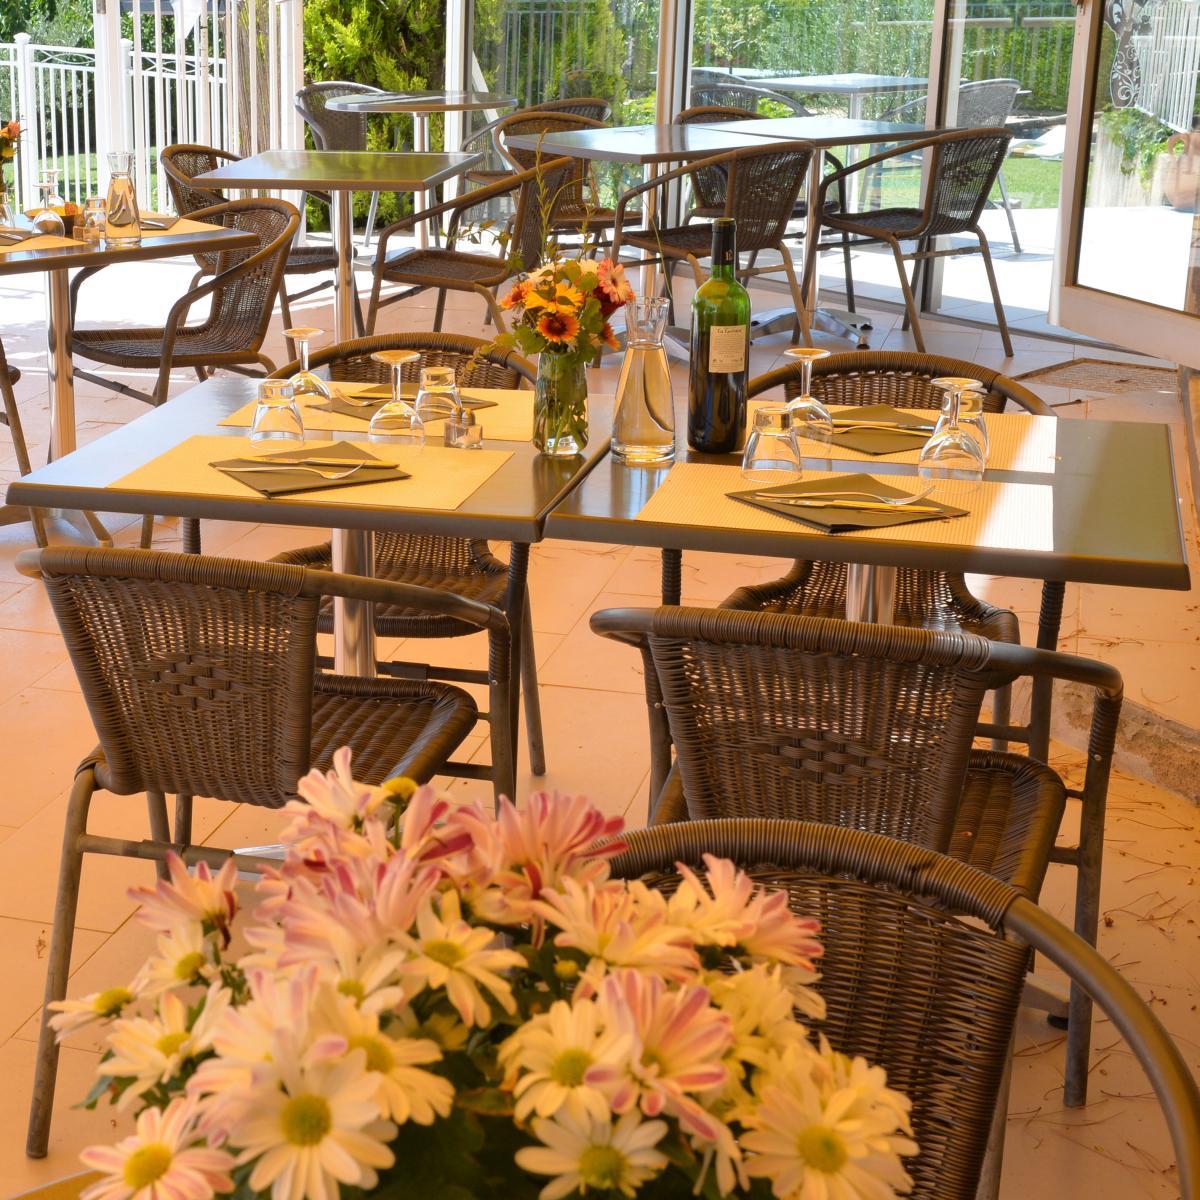 Restaurant familial avec terrasse, proche de lourmarin et de Cucuron